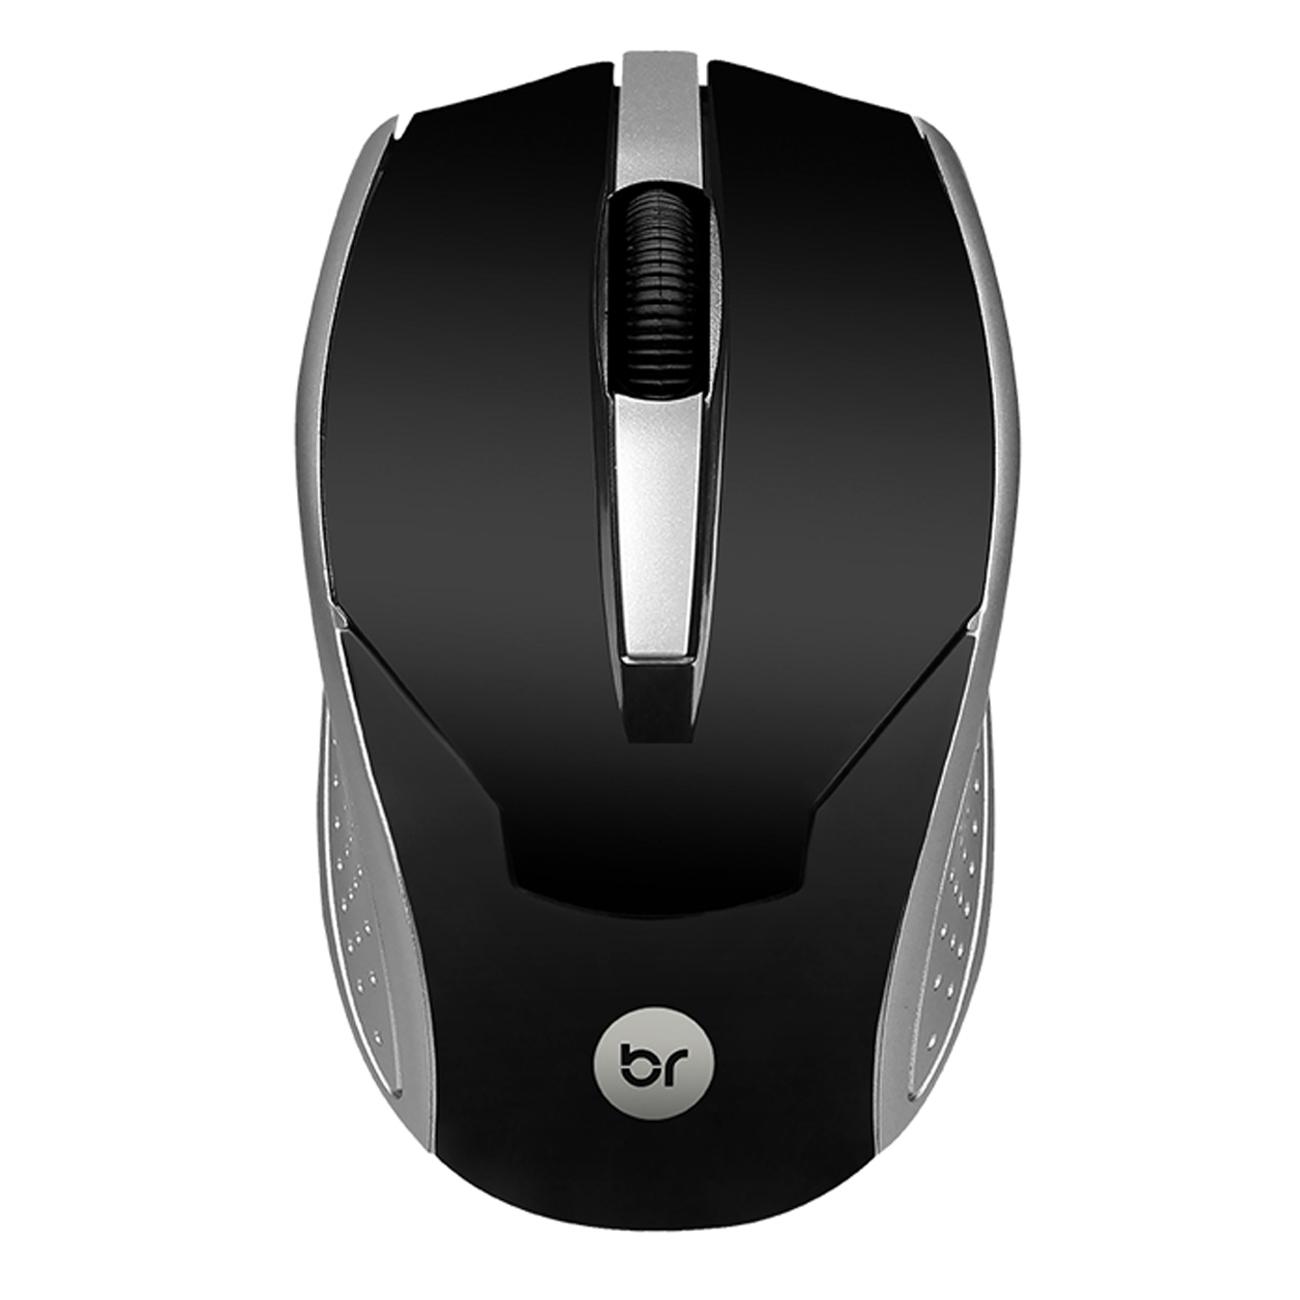 Kit 10 Mouses Usb Preto e Prata 800Dpi Bright 28